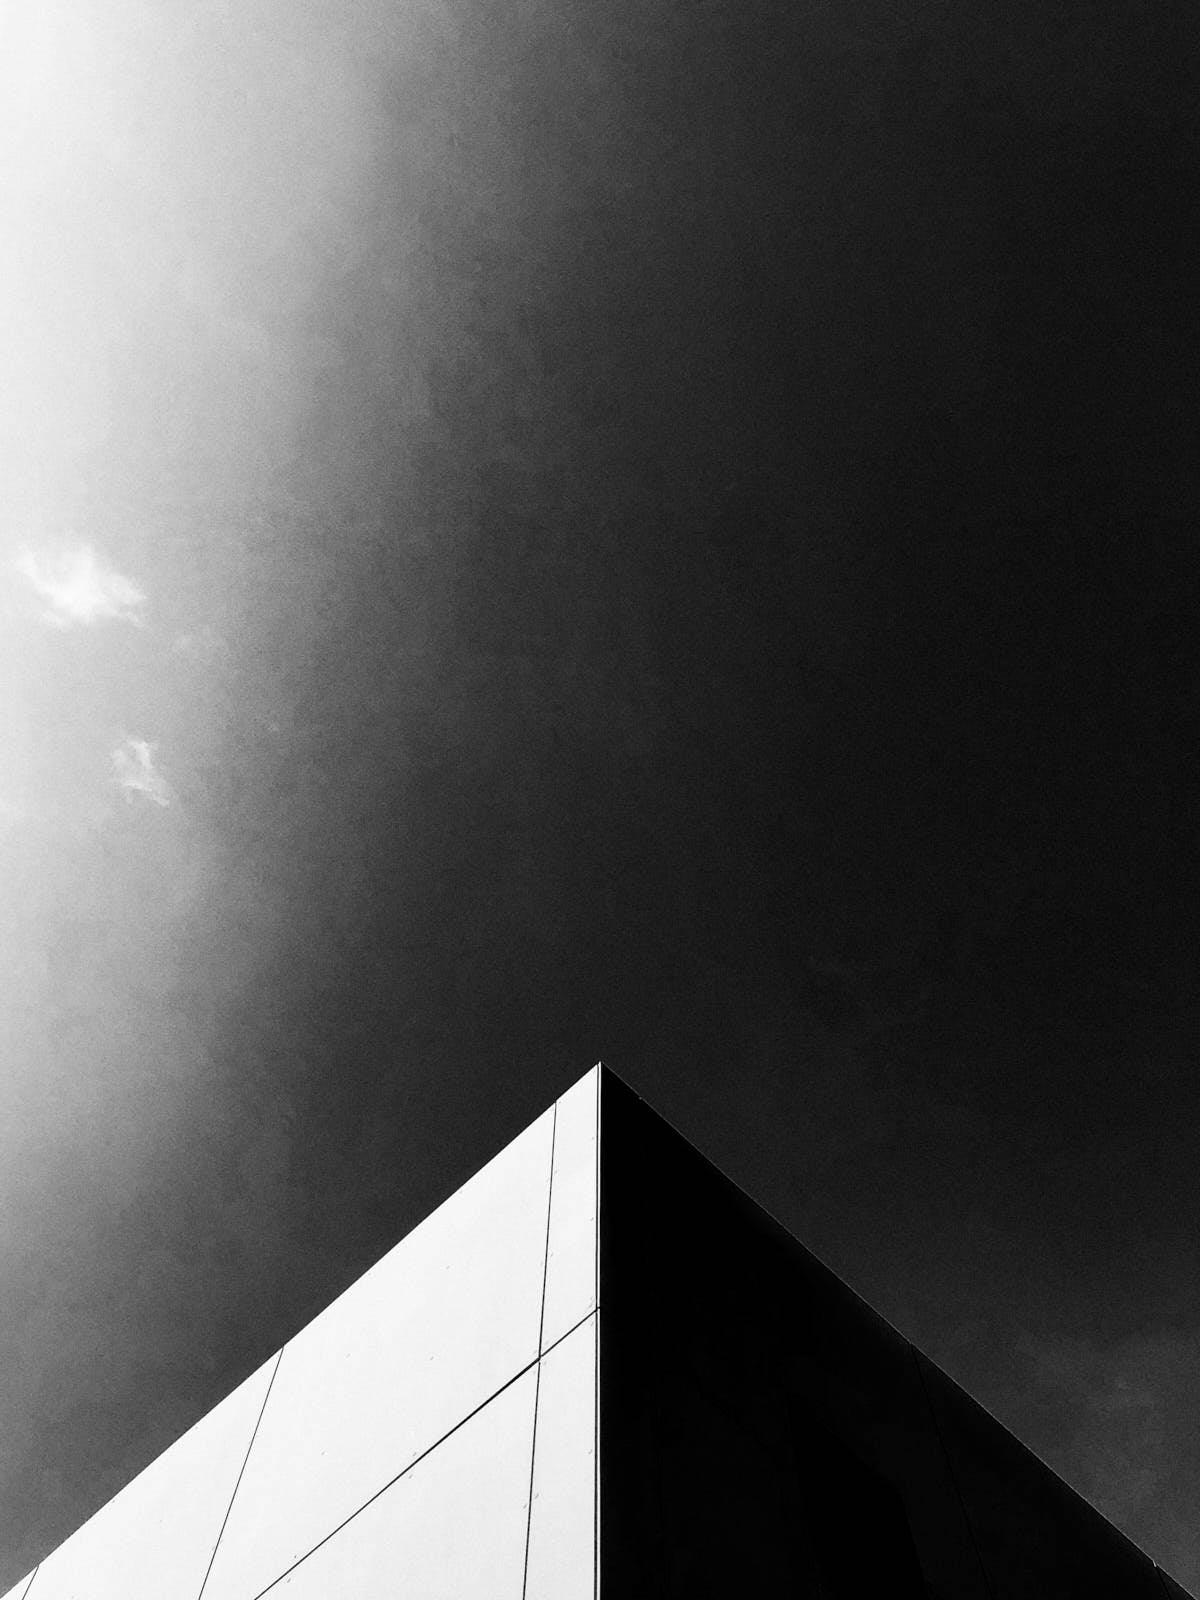 minimalist photography of a pyramidal shape